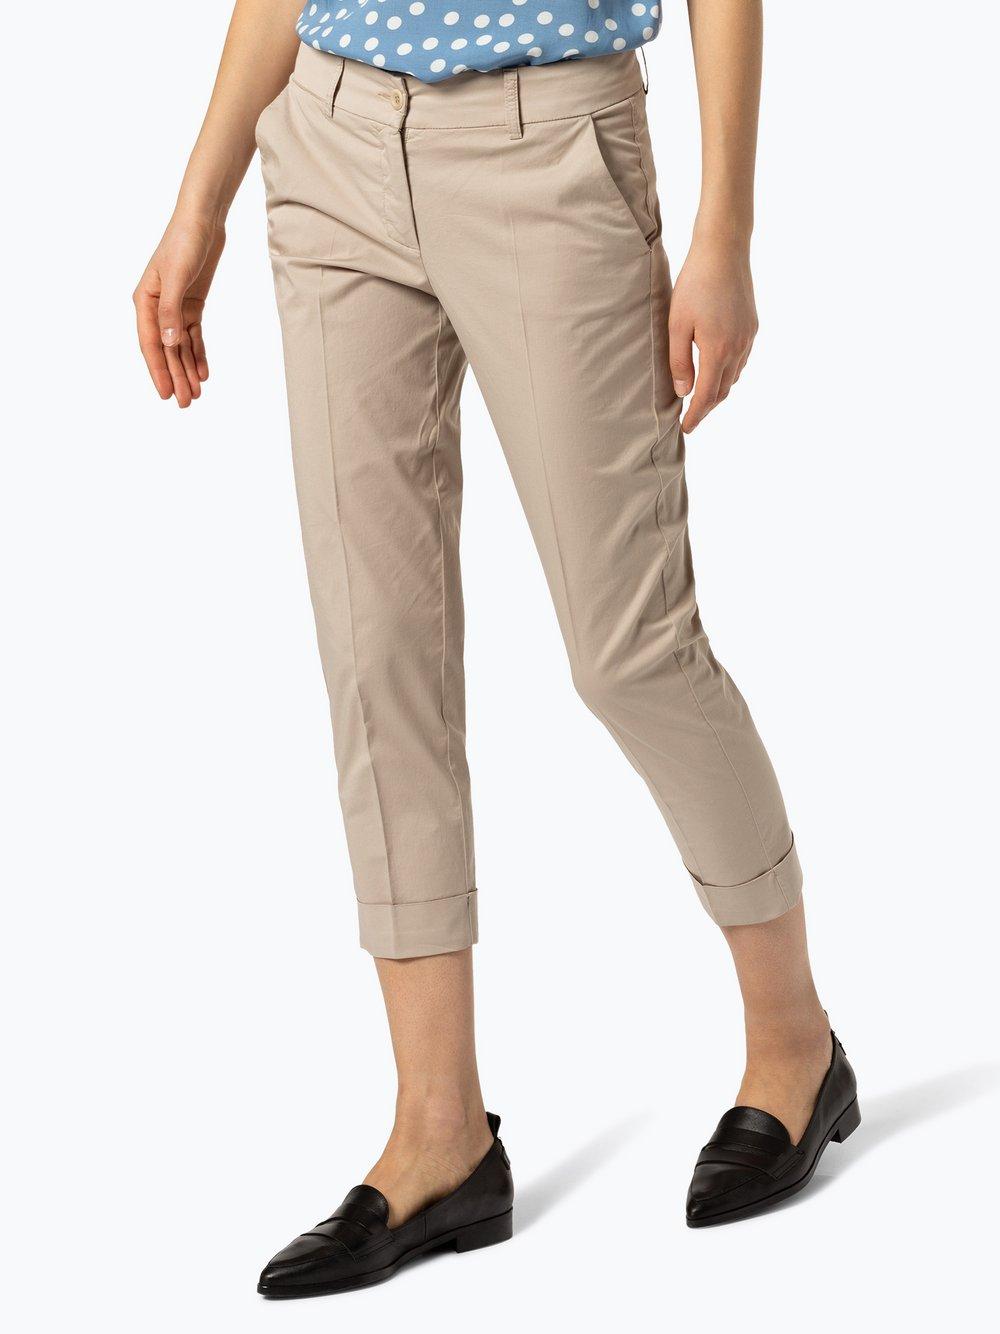 RAFFAELLO ROSSI – Spodnie damskie – Dora, beżowy Van Graaf 430365-0003-00460